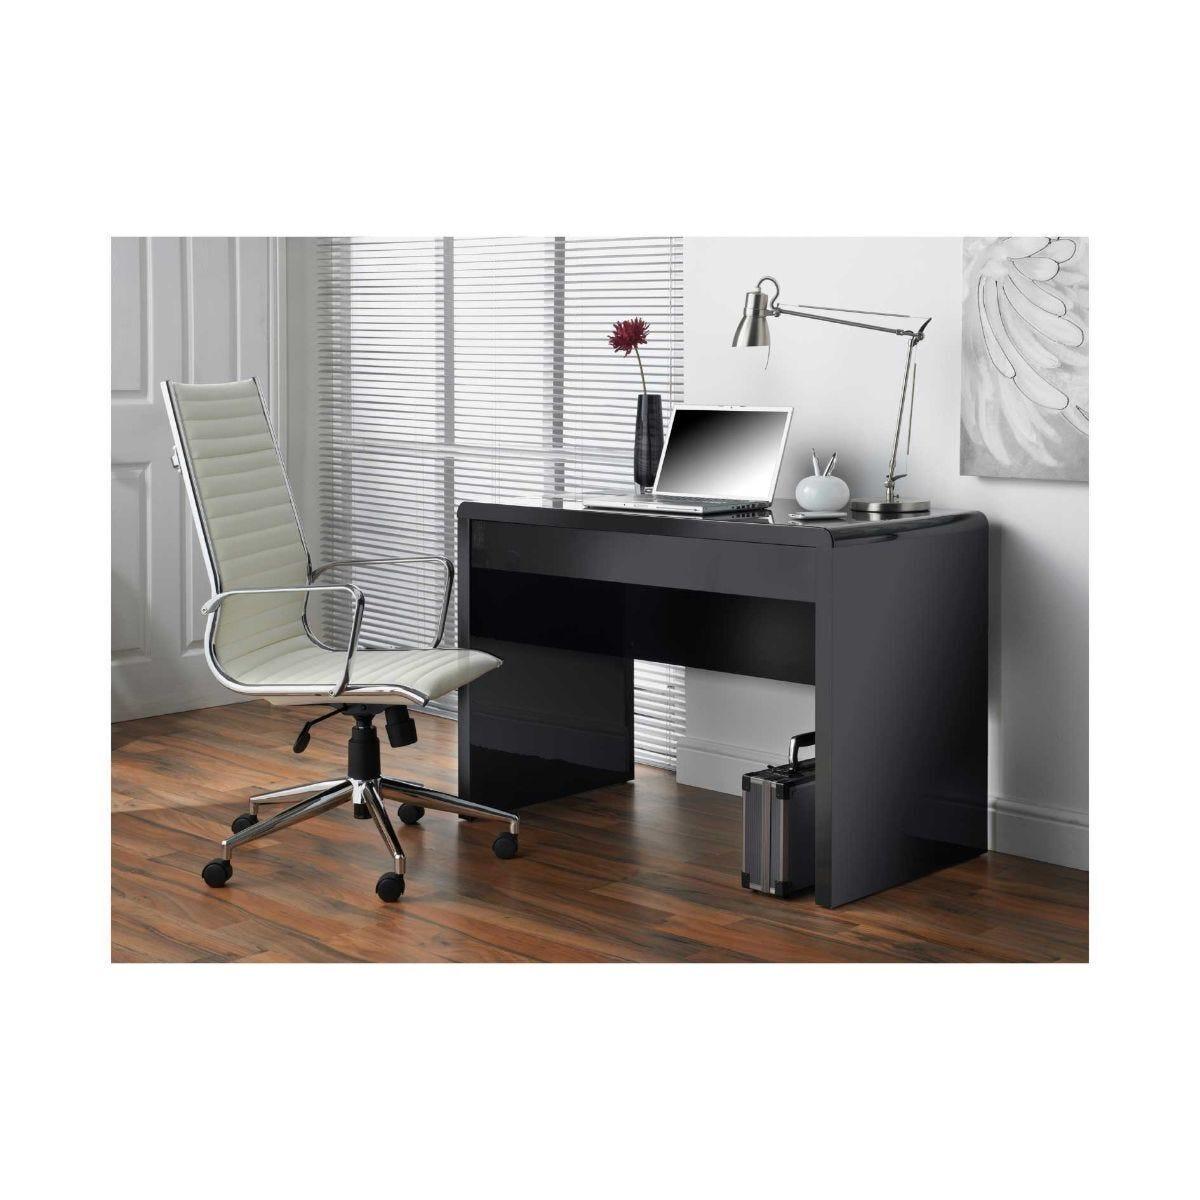 Luxor Gloss Workstation/Desk with Hidden Drawer Black